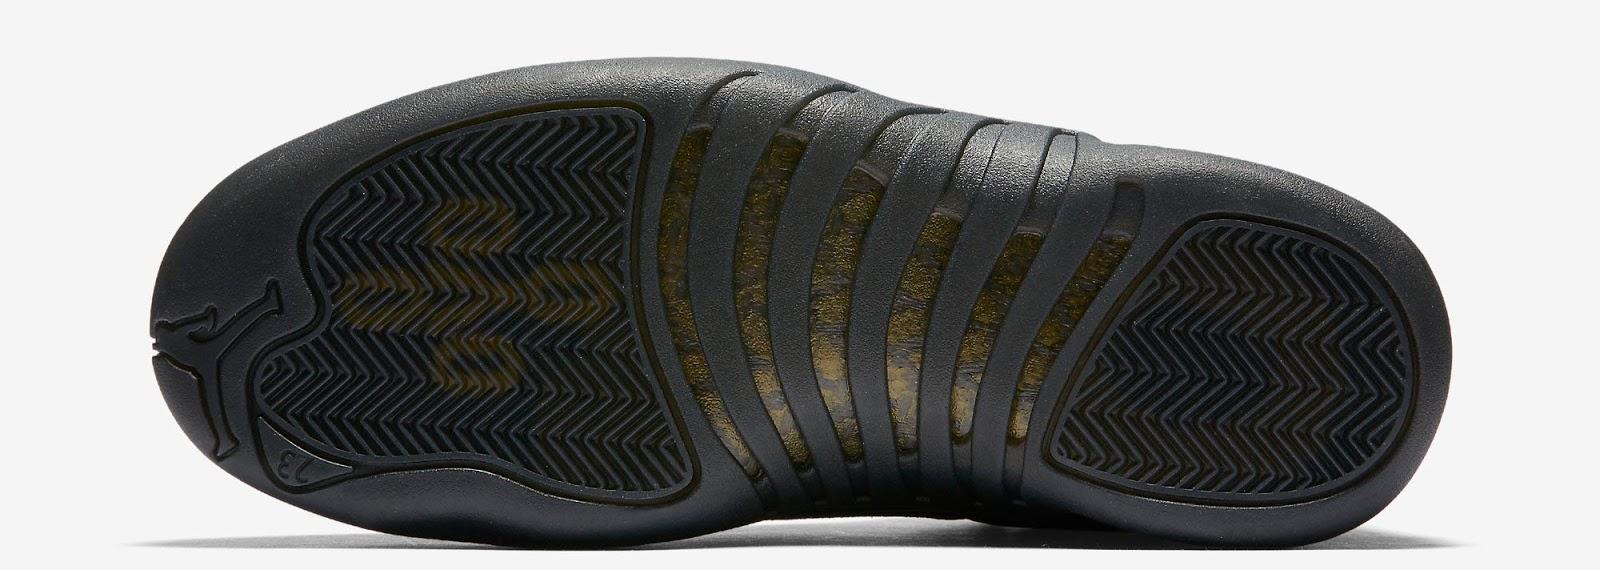 the best attitude 4a163 002dc ajordanxi Your  1 Source For Sneaker Release Dates  Air Jordan 12 ...